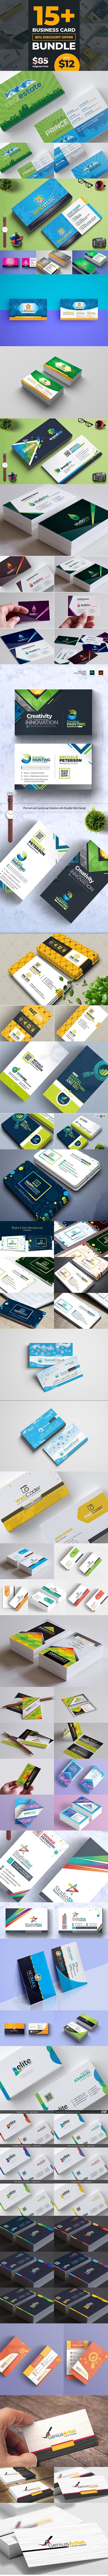 CreativeMarket - Business Card Template Bundle 3605436